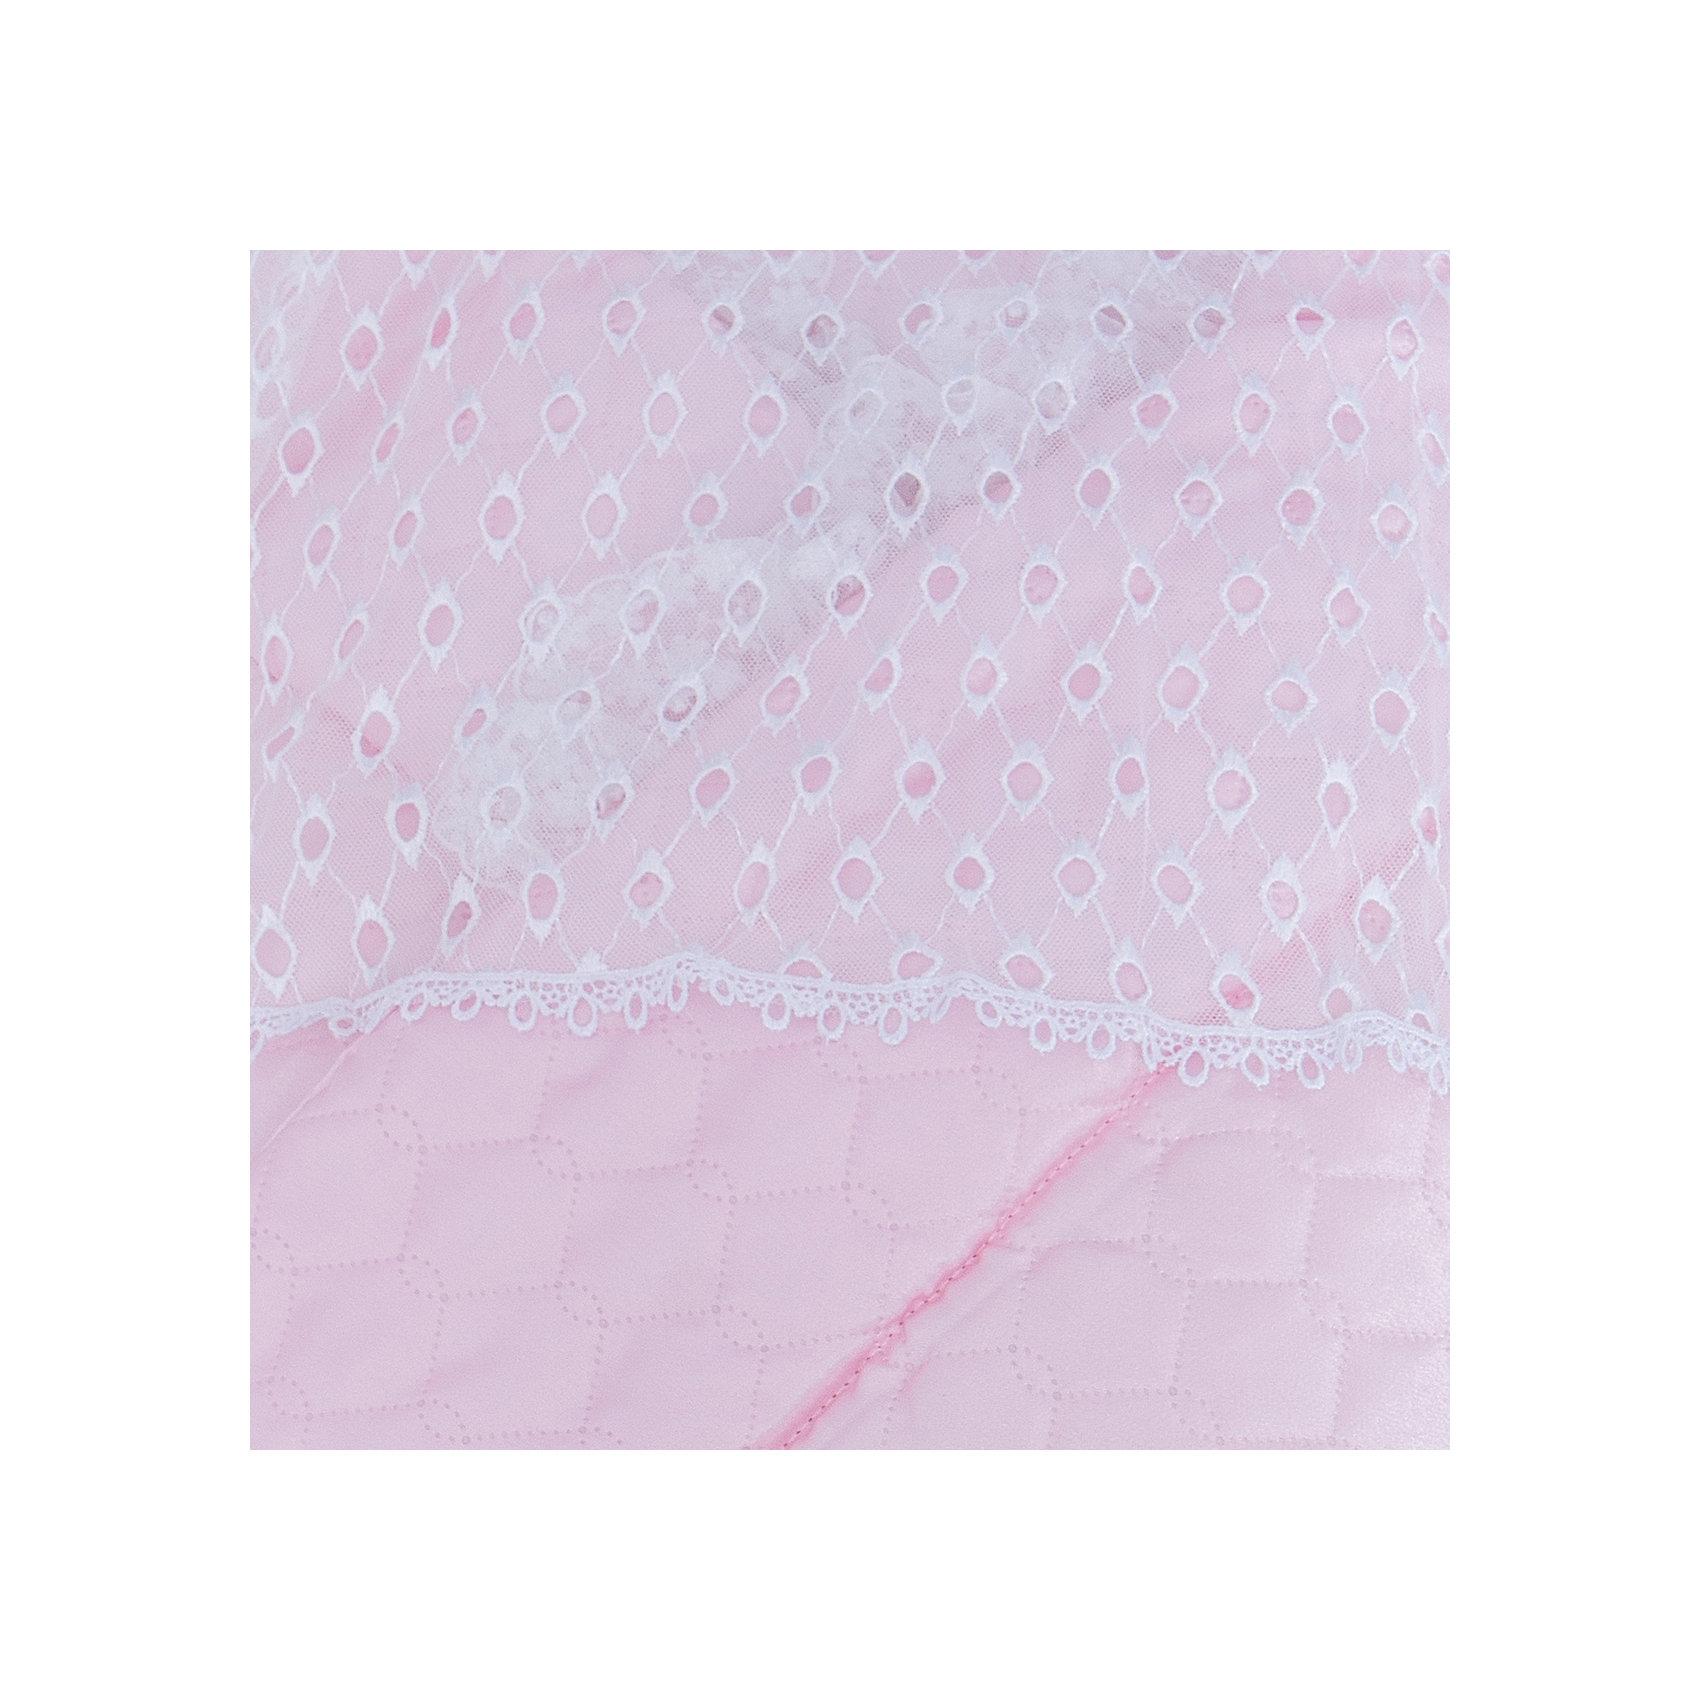 Конверт зимний, атлас., Leader kids, розовый, пакет, пвх от myToys